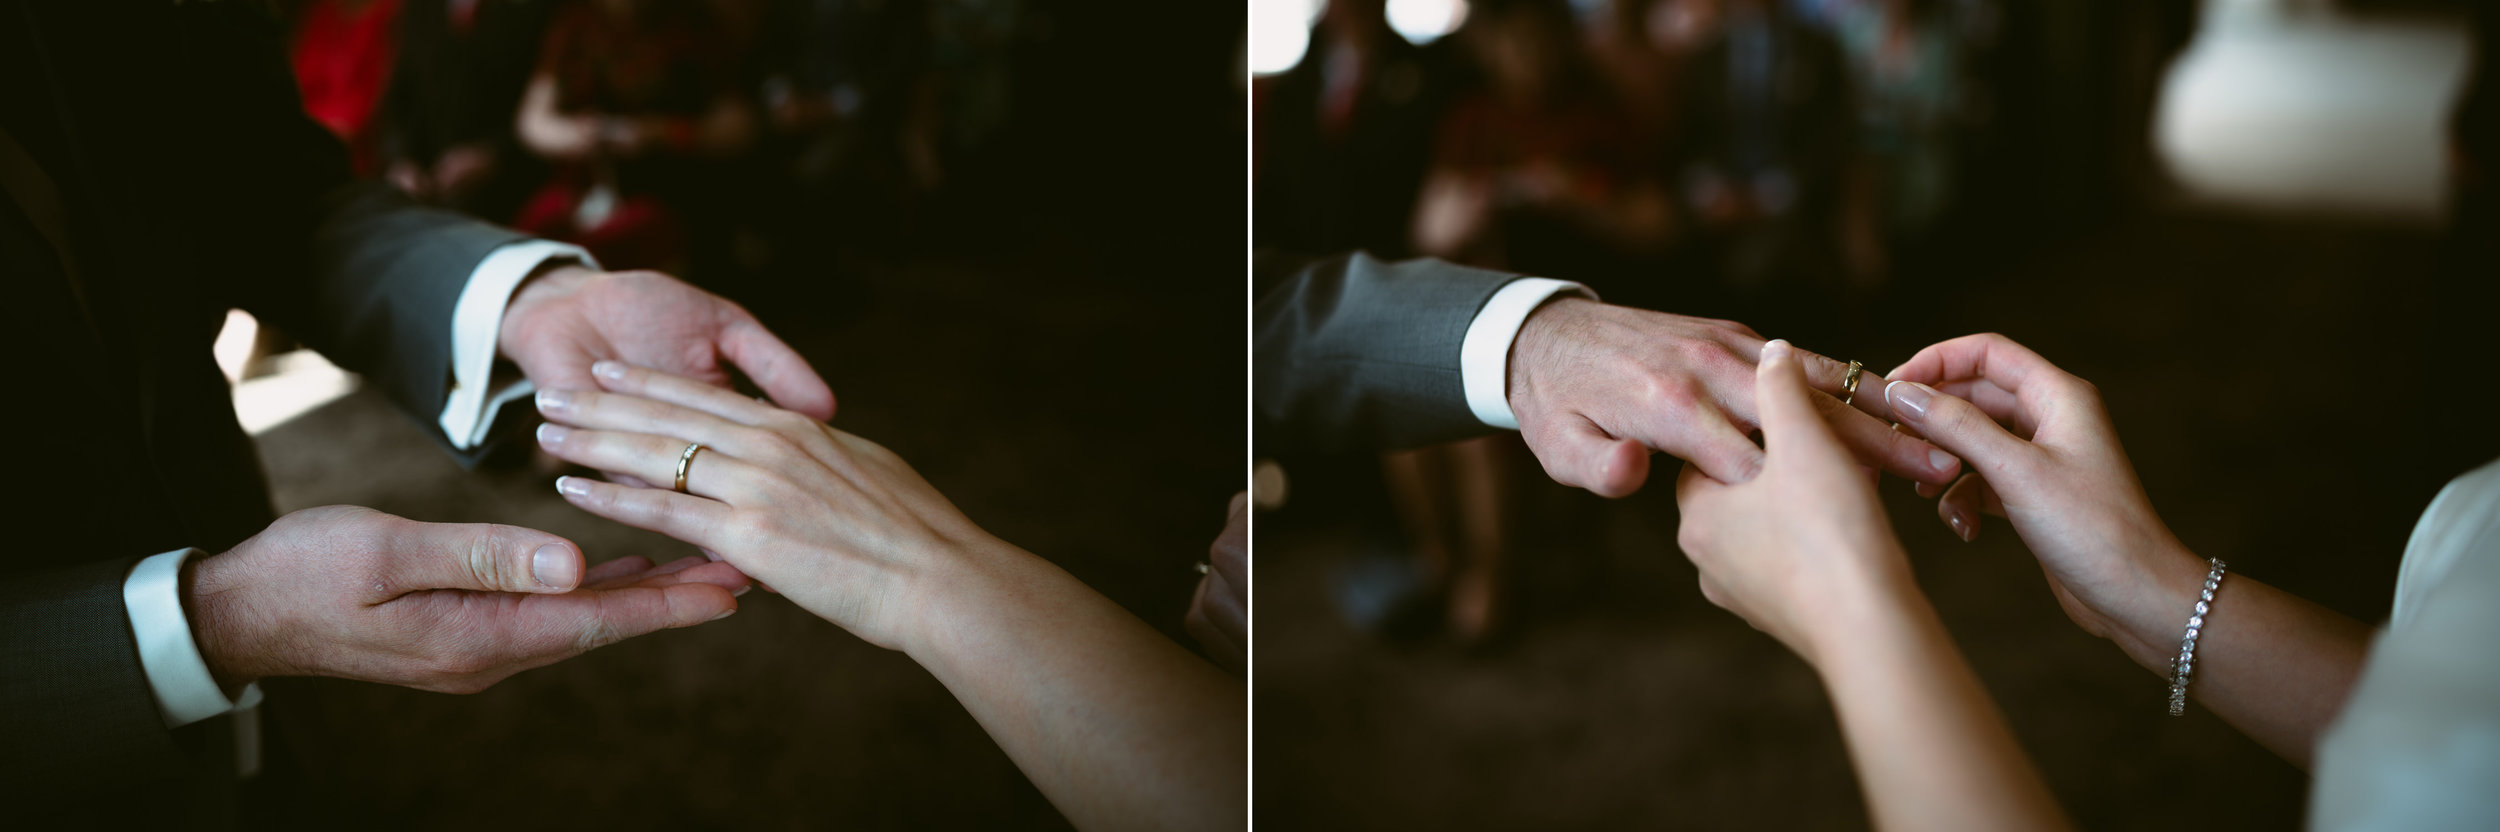 bruidsfotografie-amsterdam-utrecht-trouwfotograaf-mark-hadden-wedding-photography-Yun & Geert-200 copy.jpg